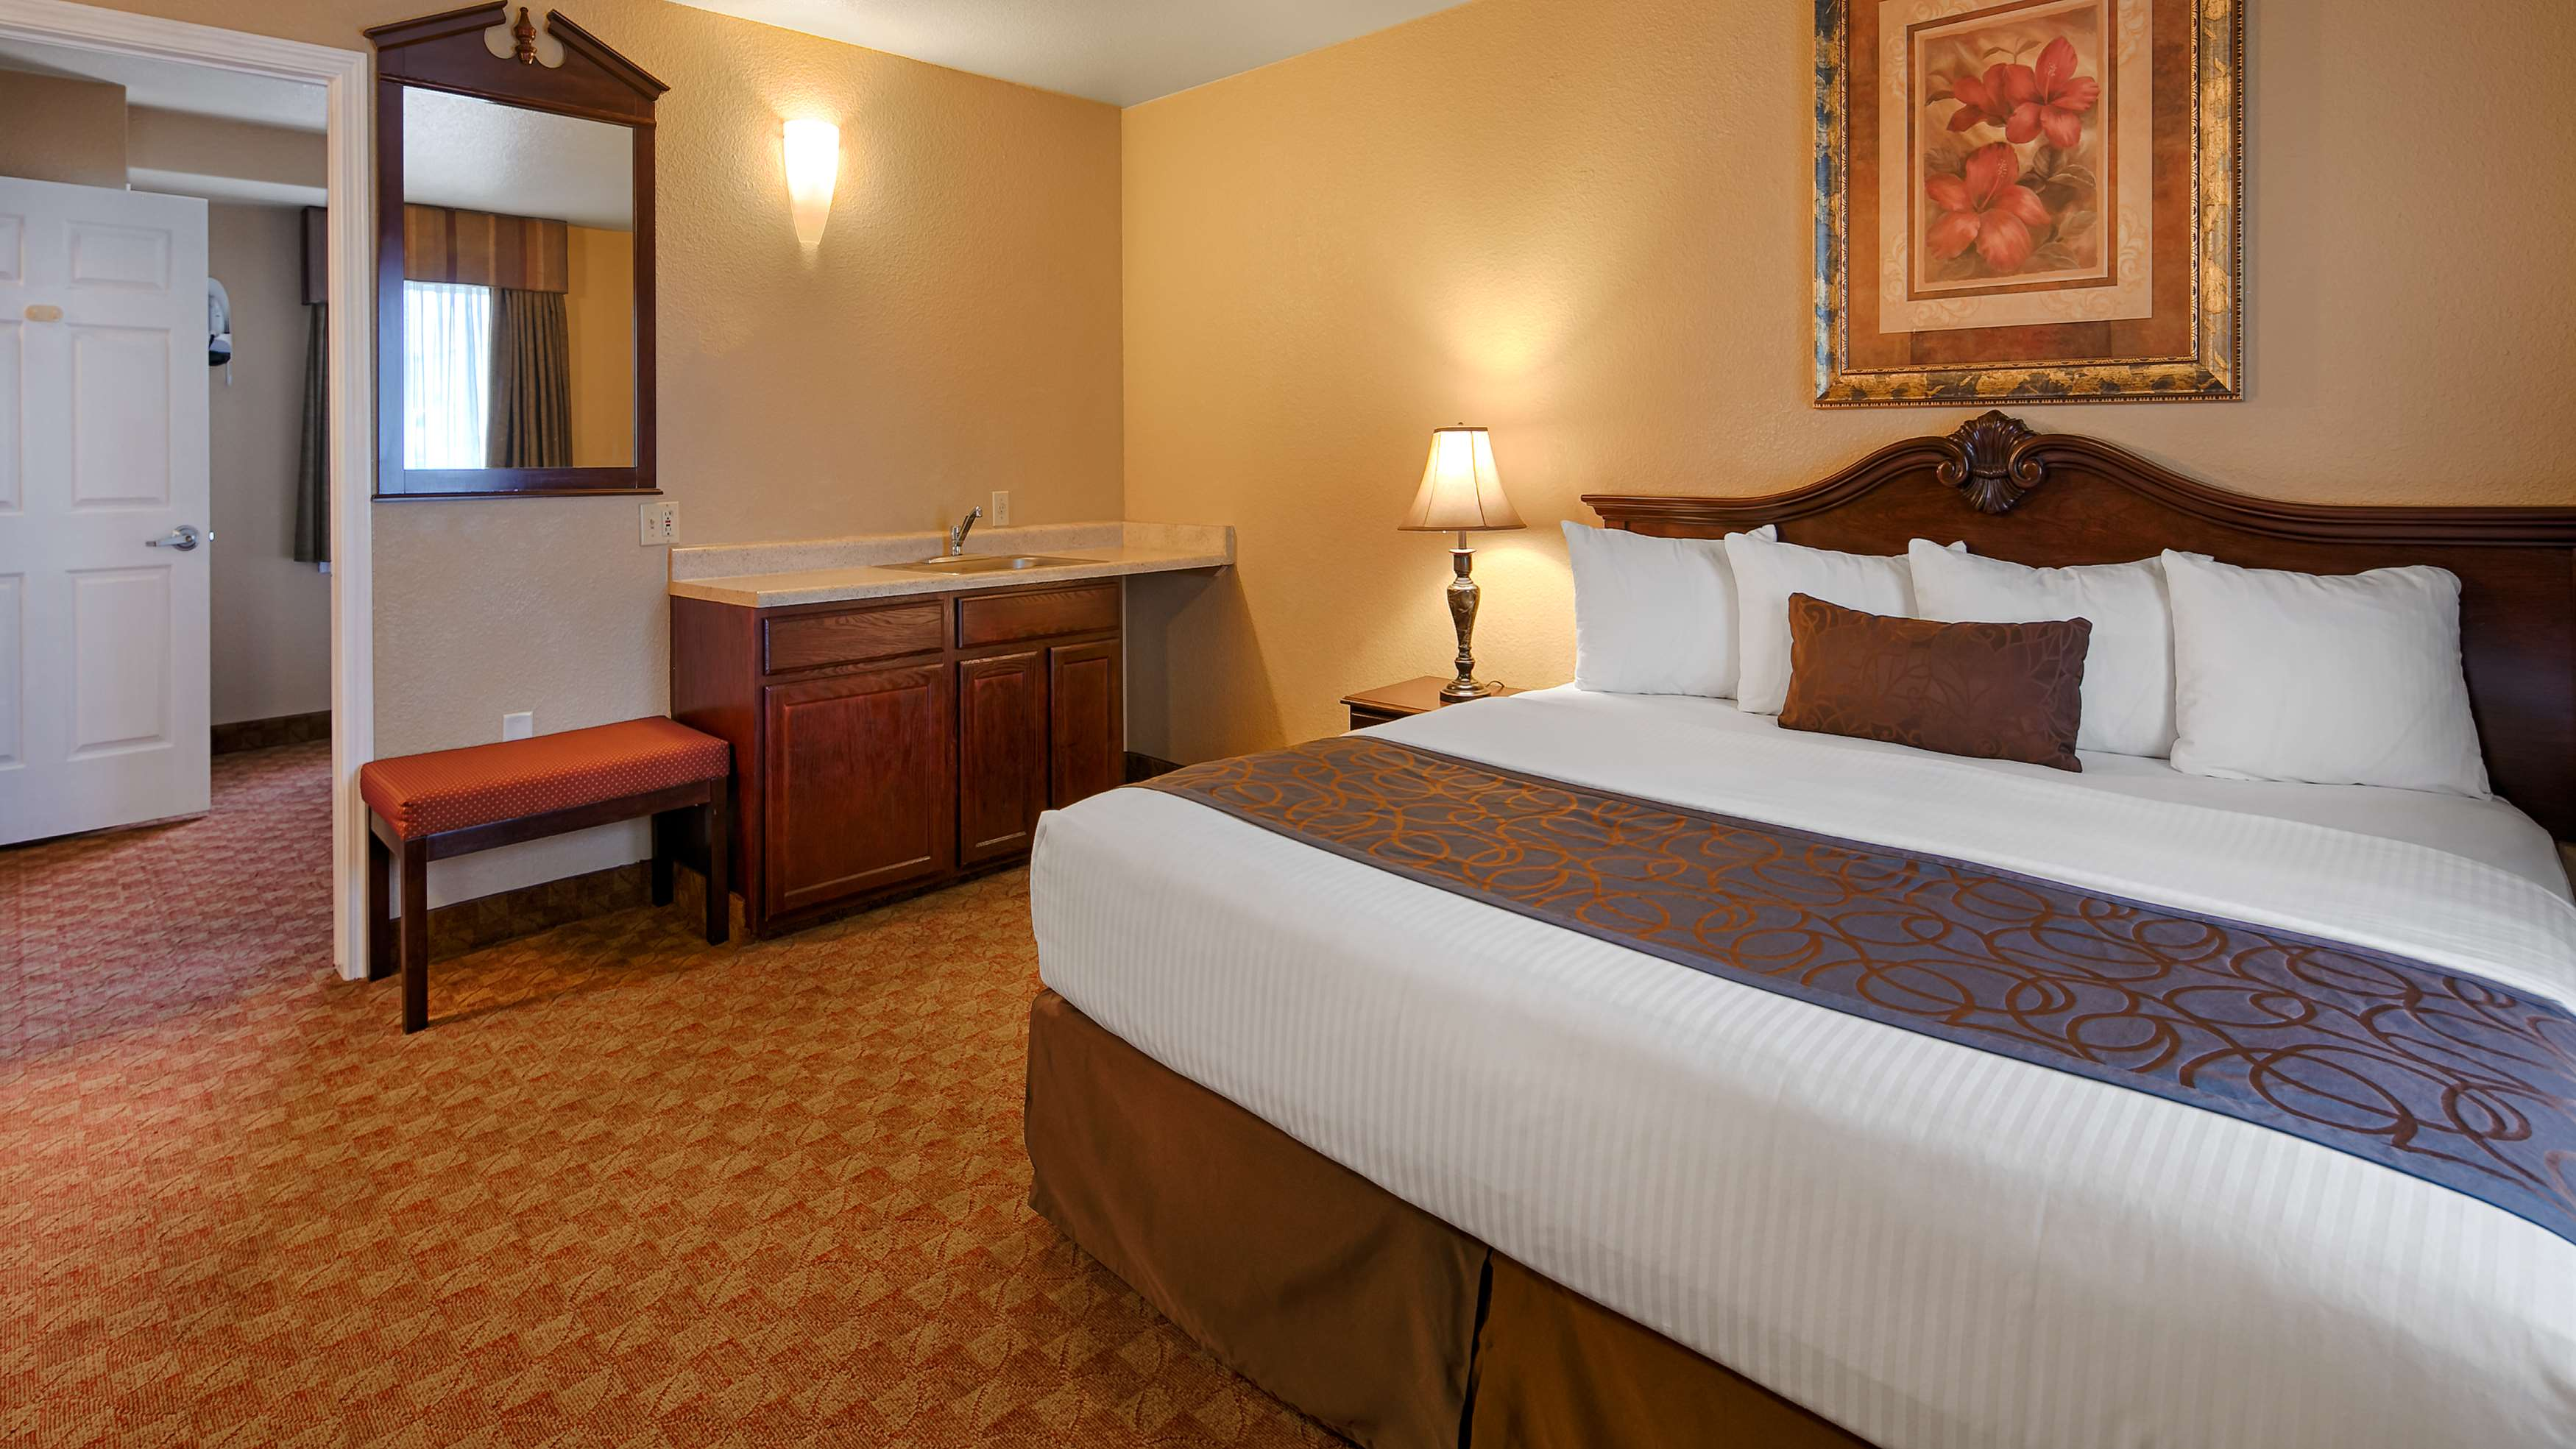 Best Western Fallon Inn & Suites image 5